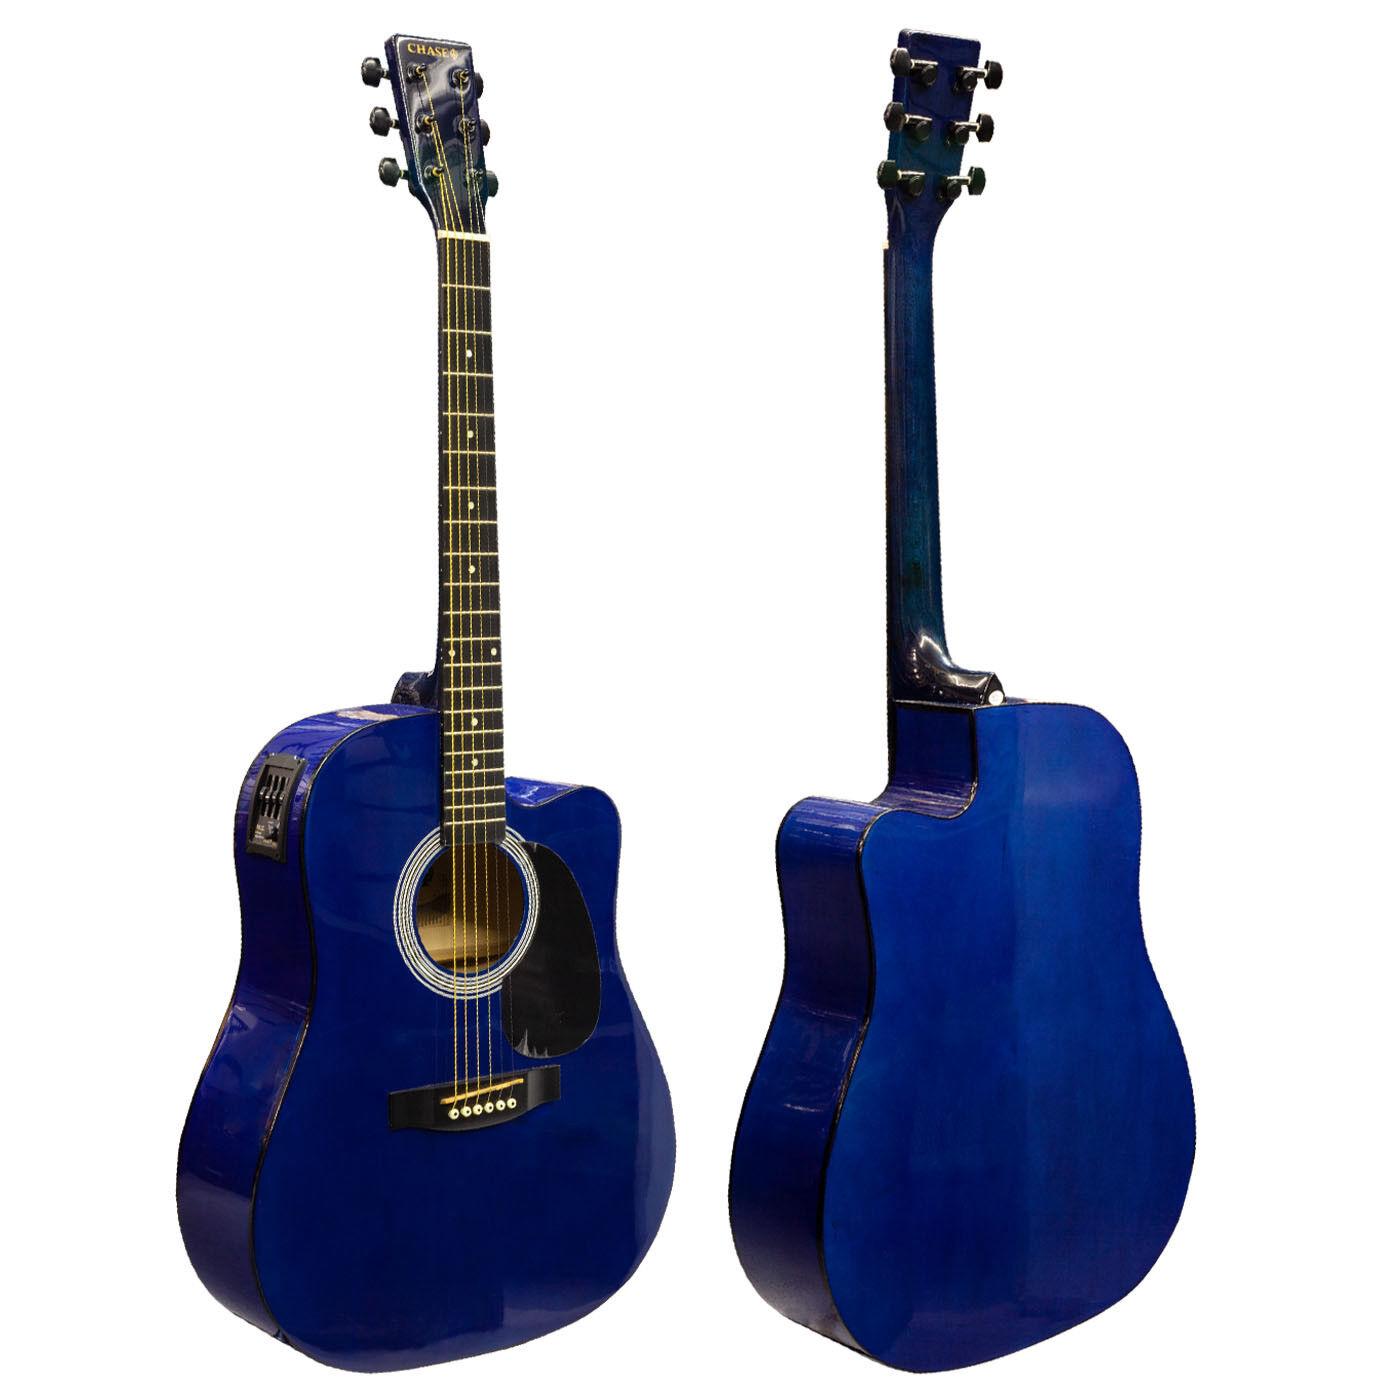 Chase SW203CETB Blau Dreadnought Electro Acoustic Guitar Cutaway Steel Strings c